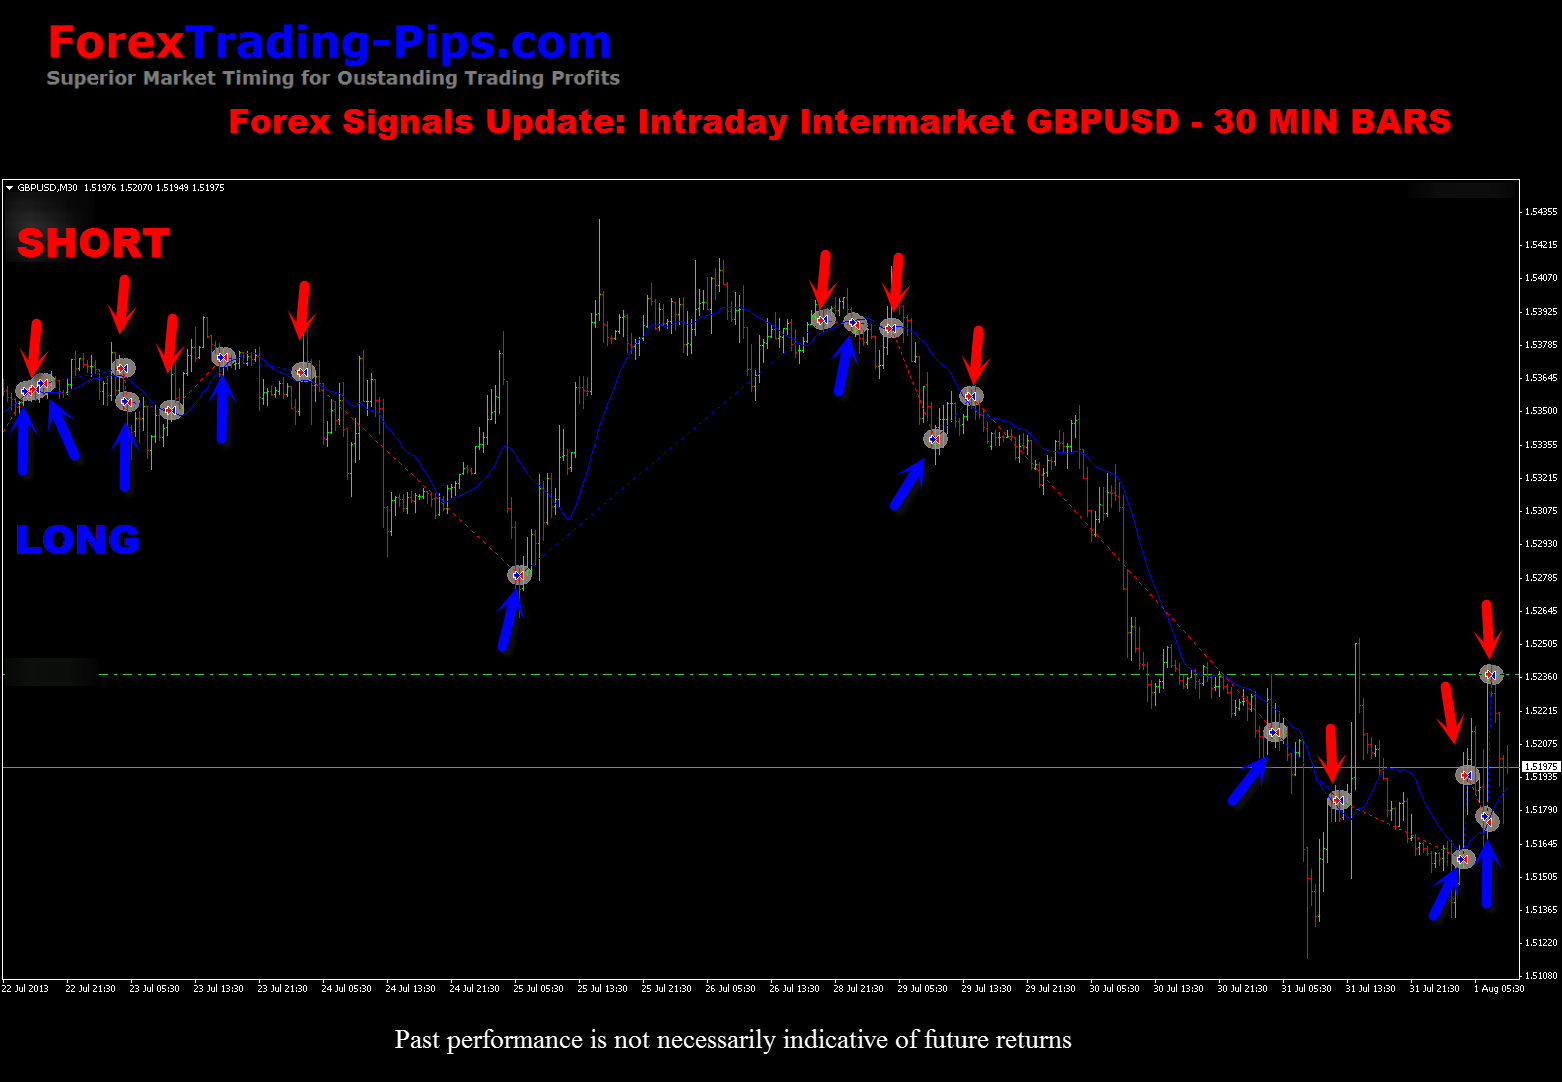 Forex Signals GBPUSD Intraday Intermarket